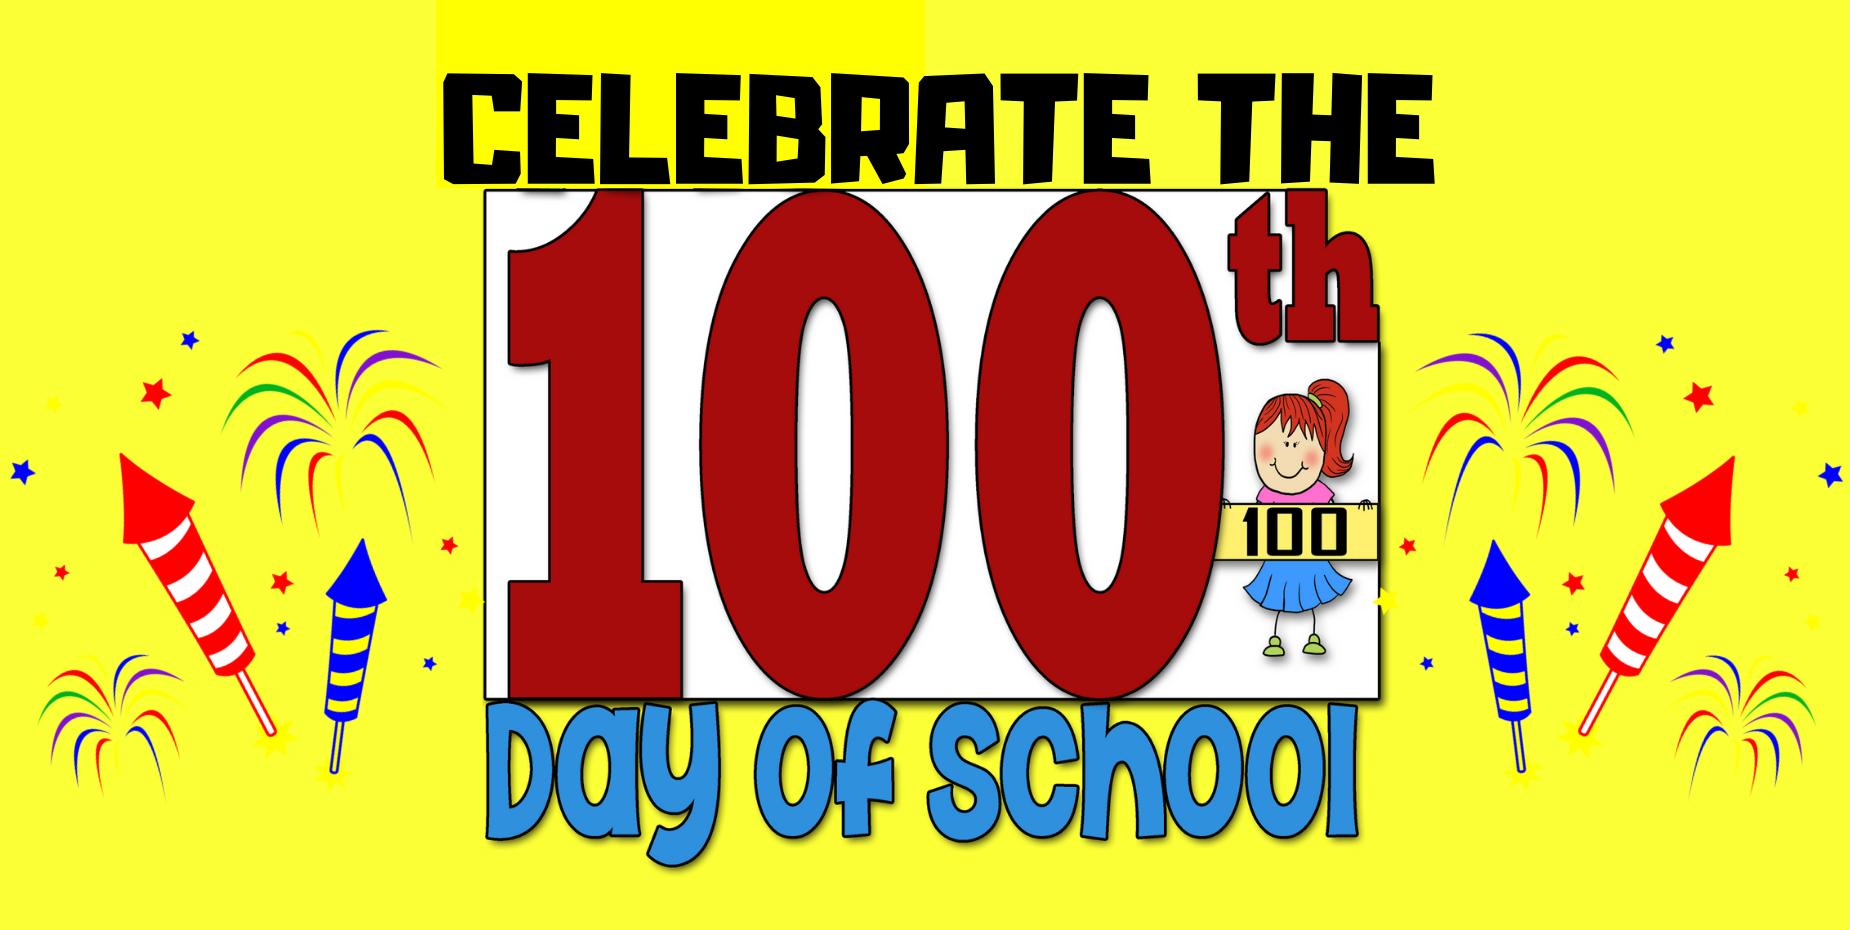 100 days of school on Monday